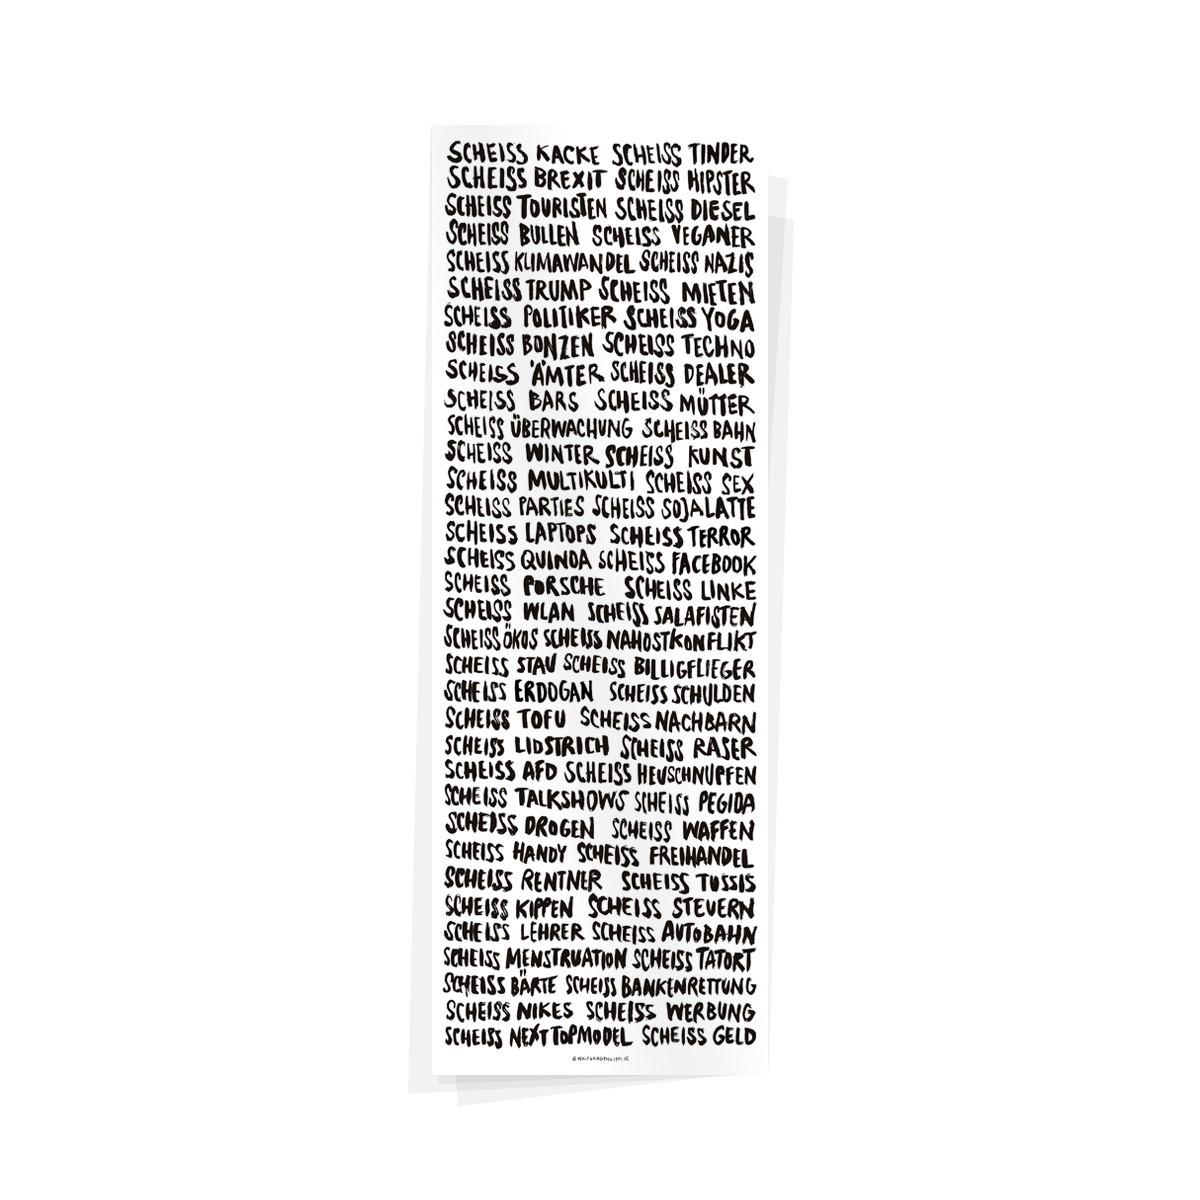 Wolfgang Philippi SCHEISS PLAKAT 21x60 cm